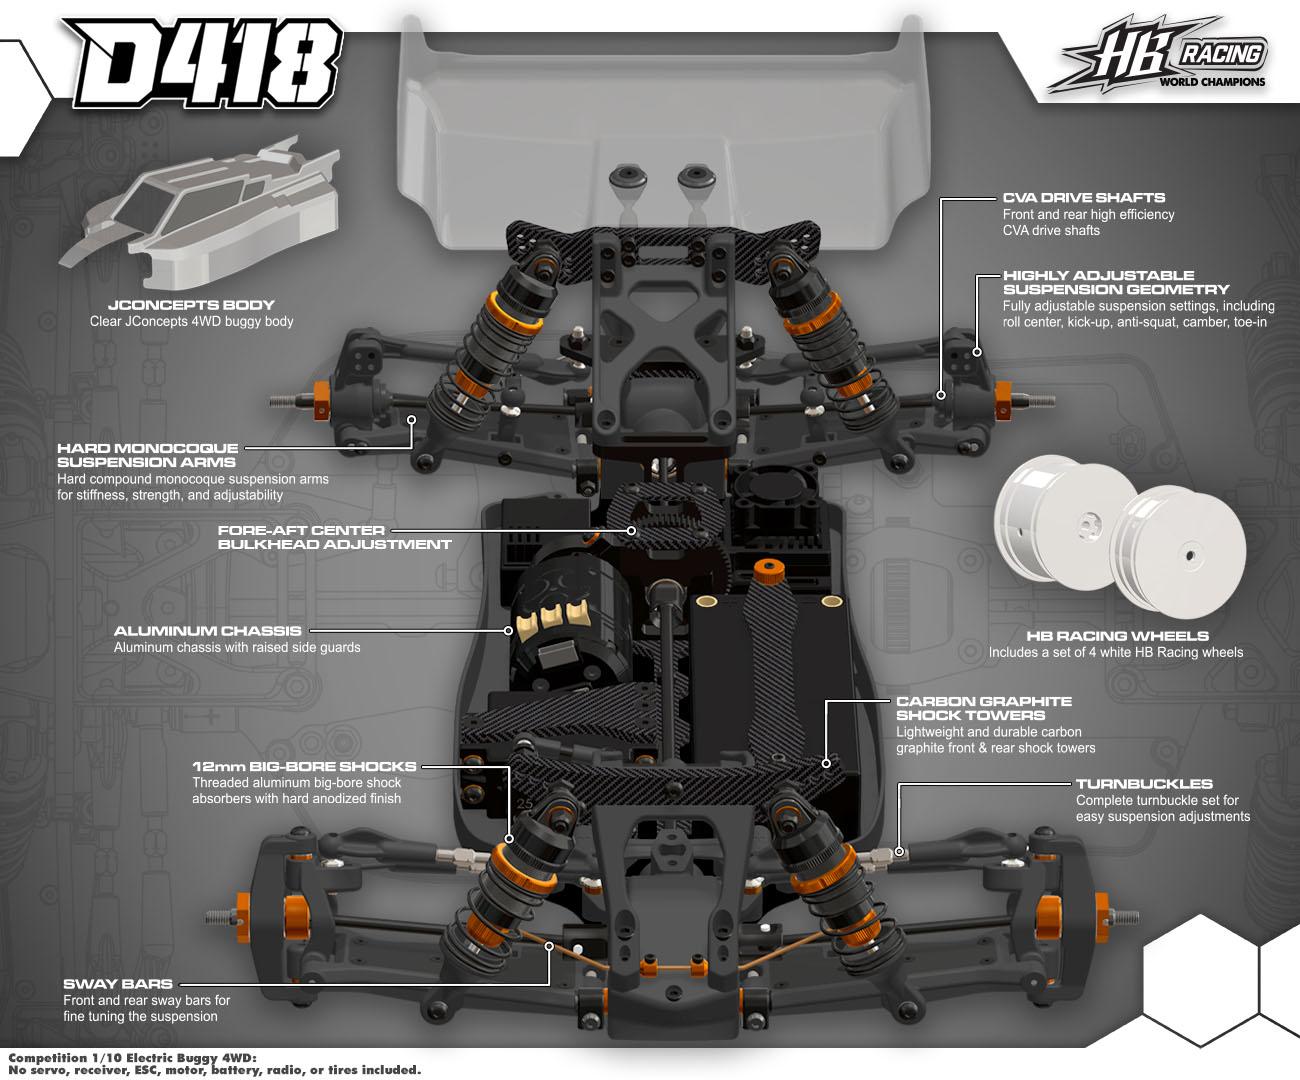 HB Racing D418 1/10 4WD Off-Road Buggy | HB Racing